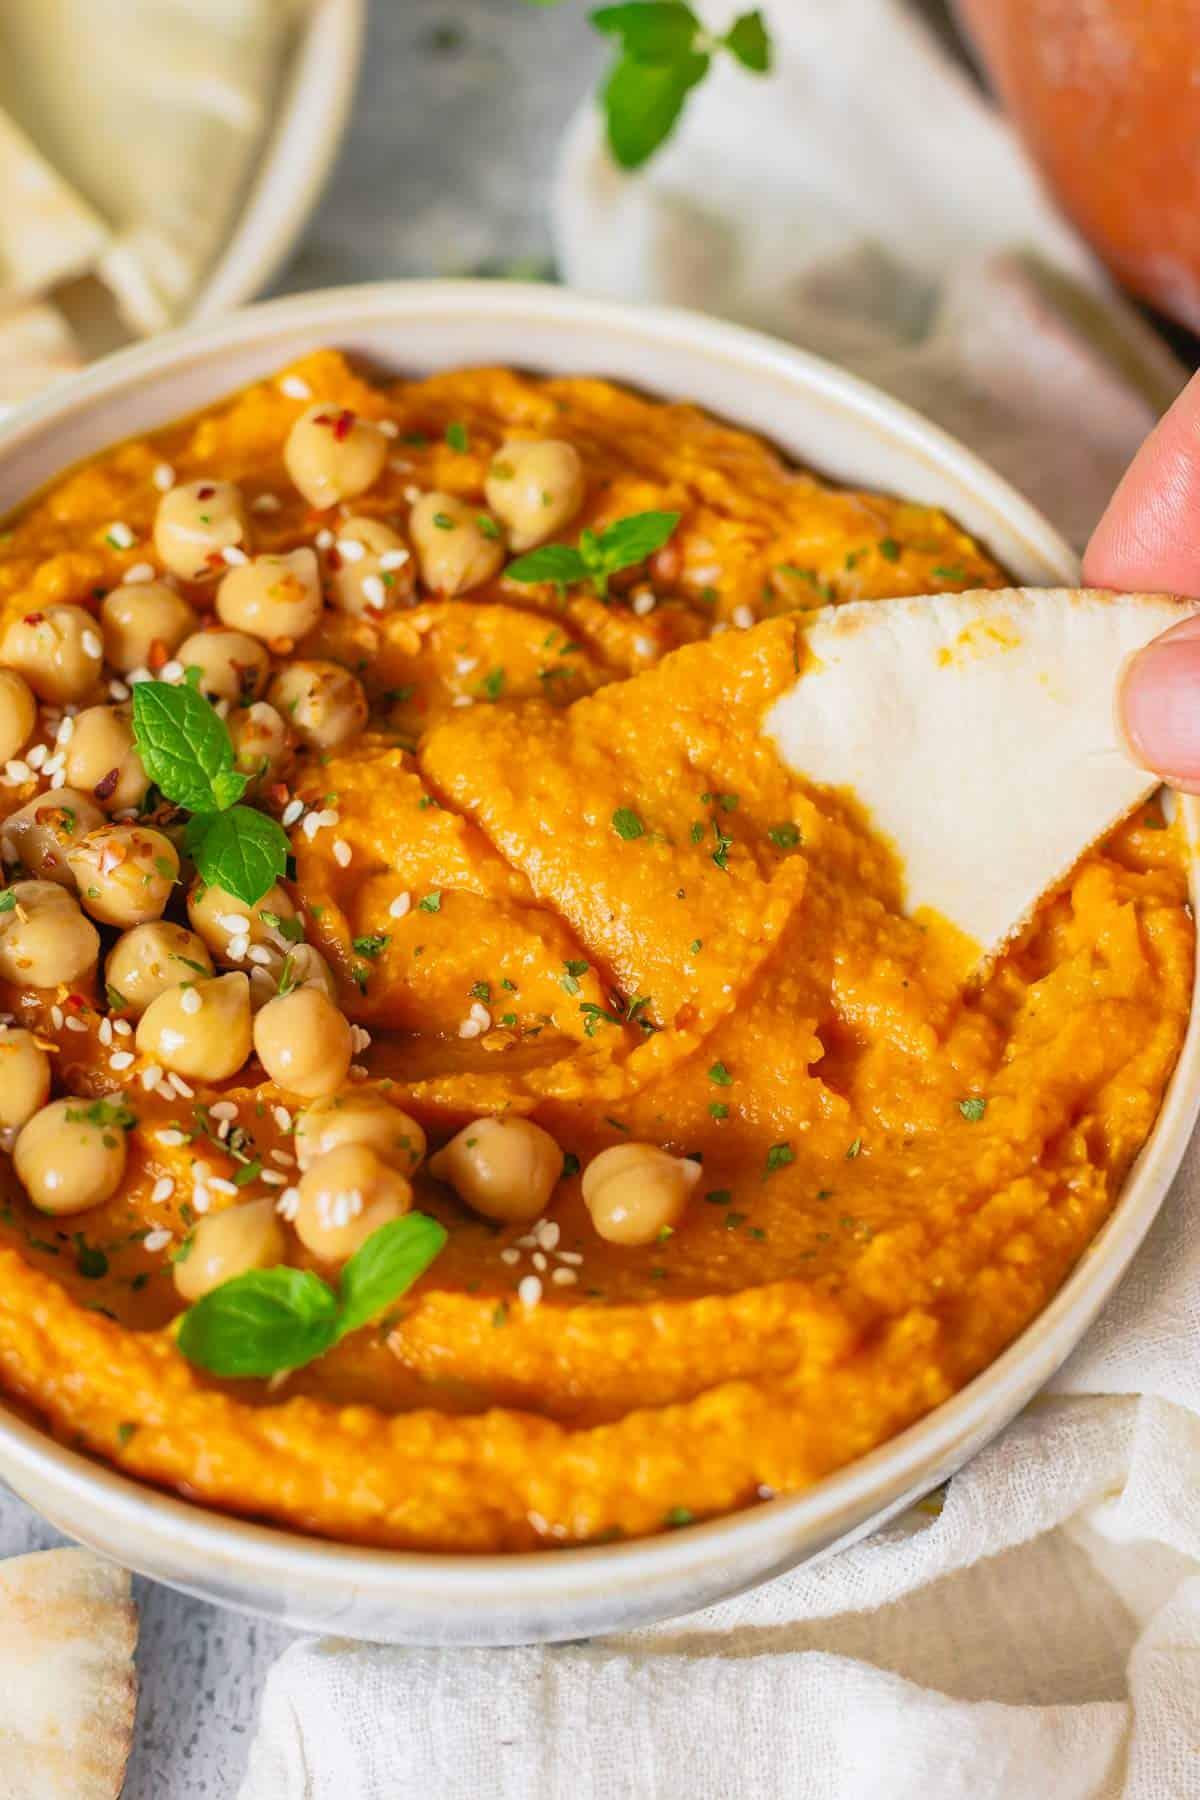 pumpkin hummus pita bread dip shot